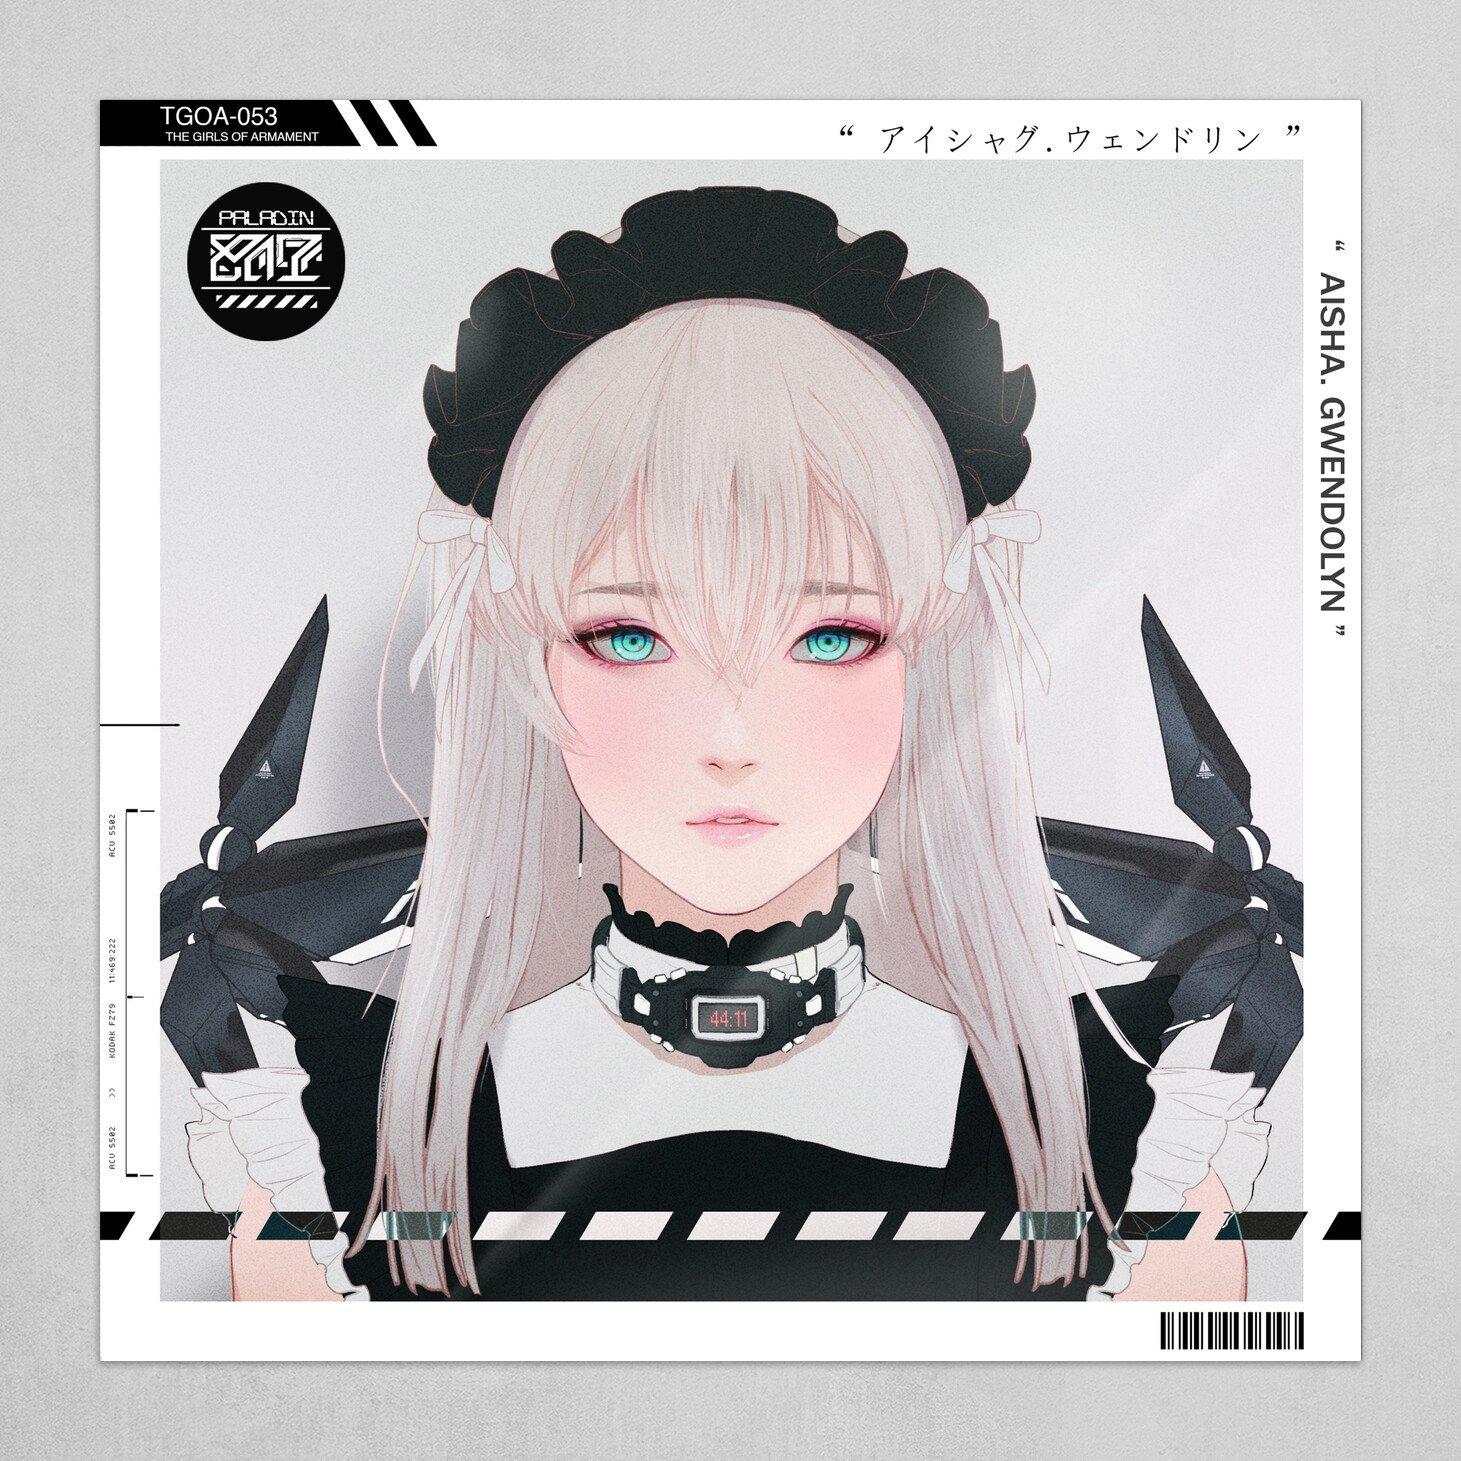 Gharliera Drawing Women Anime Girls Silver Hair Portrait Hair Accessories Frame Poster Blue Eyes 1461x1461